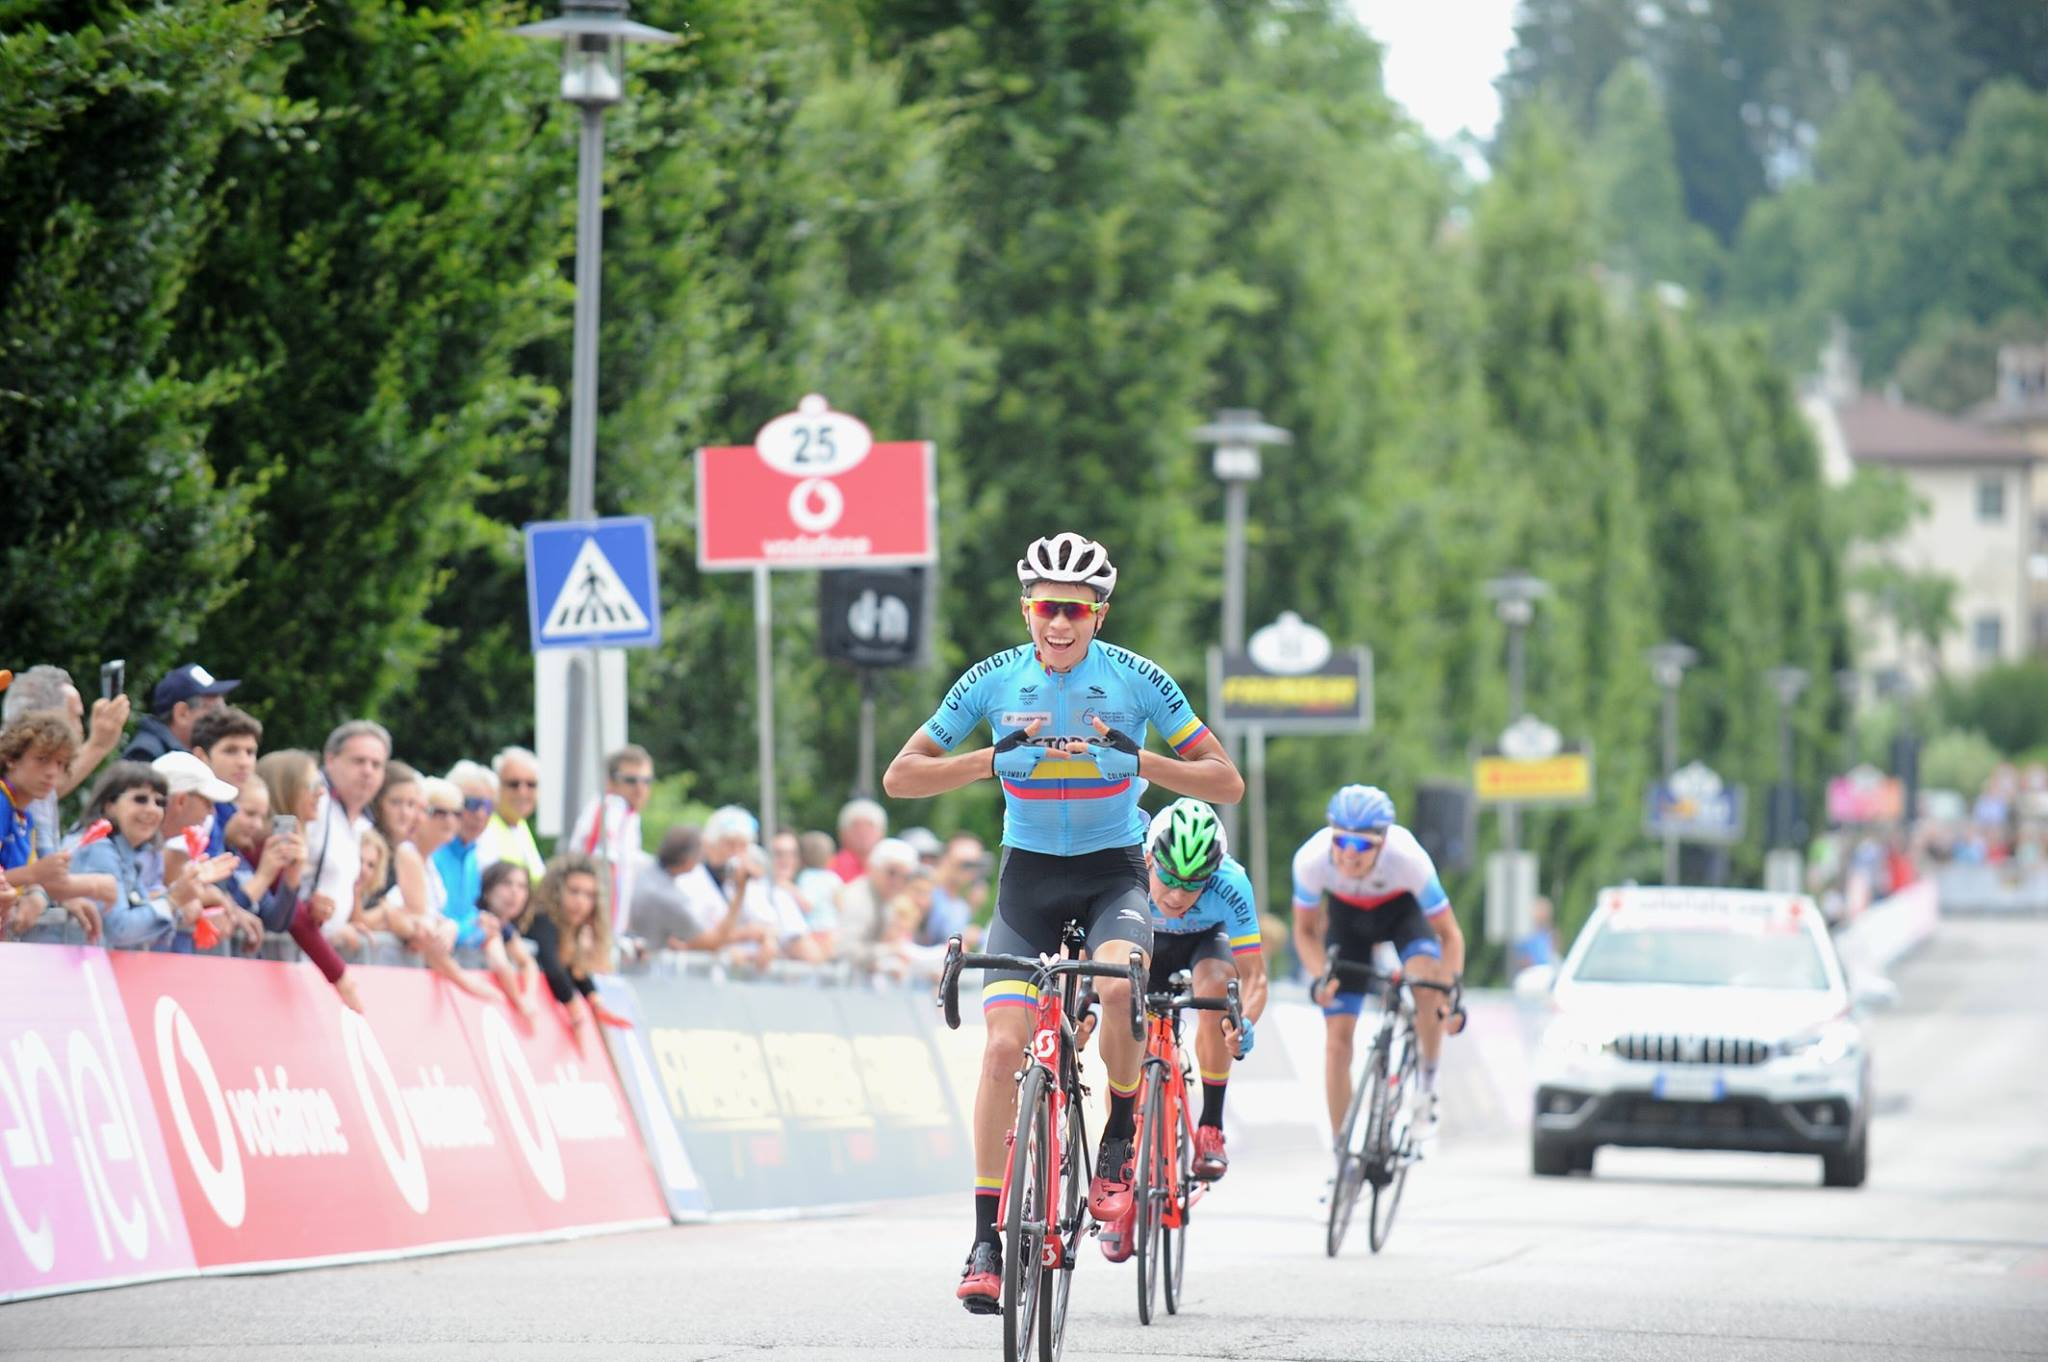 Cristian Munoz vince l'ottava tappa del Giro d'Italia Under 23 2018